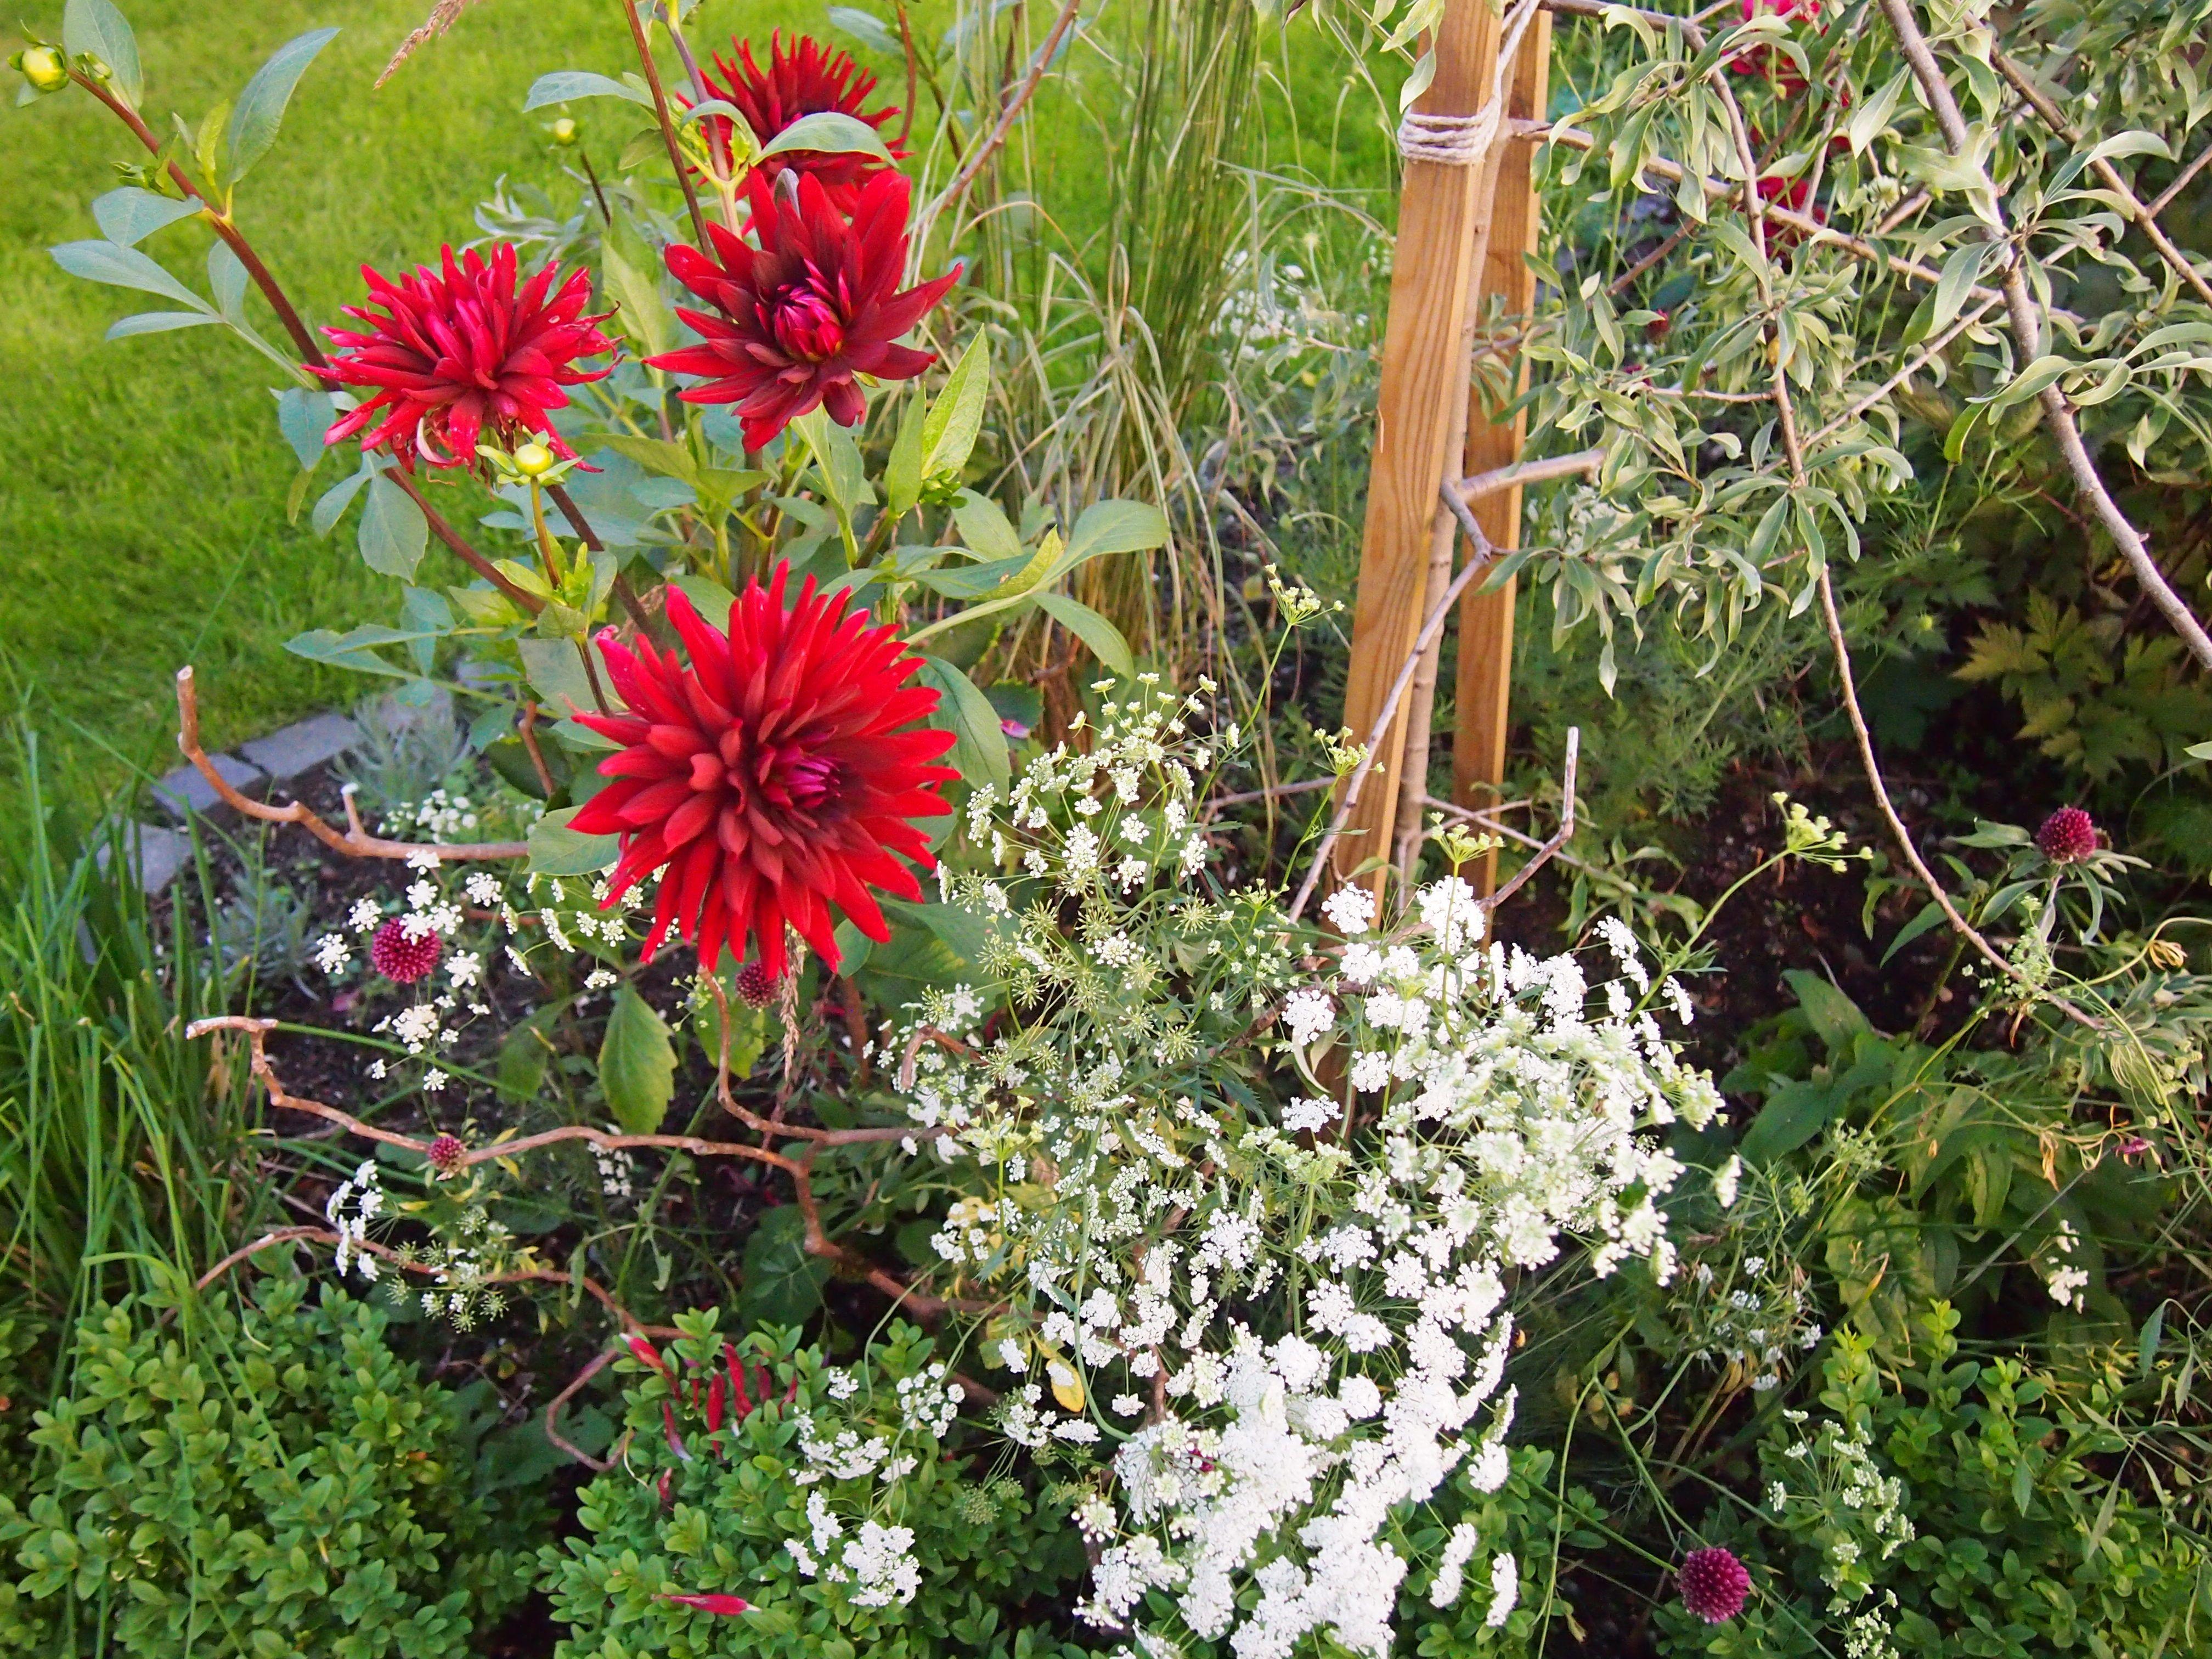 August_2013_Dahlia, Ammi Majus, Allium sphaerocephalon, Pyrus salicifolia